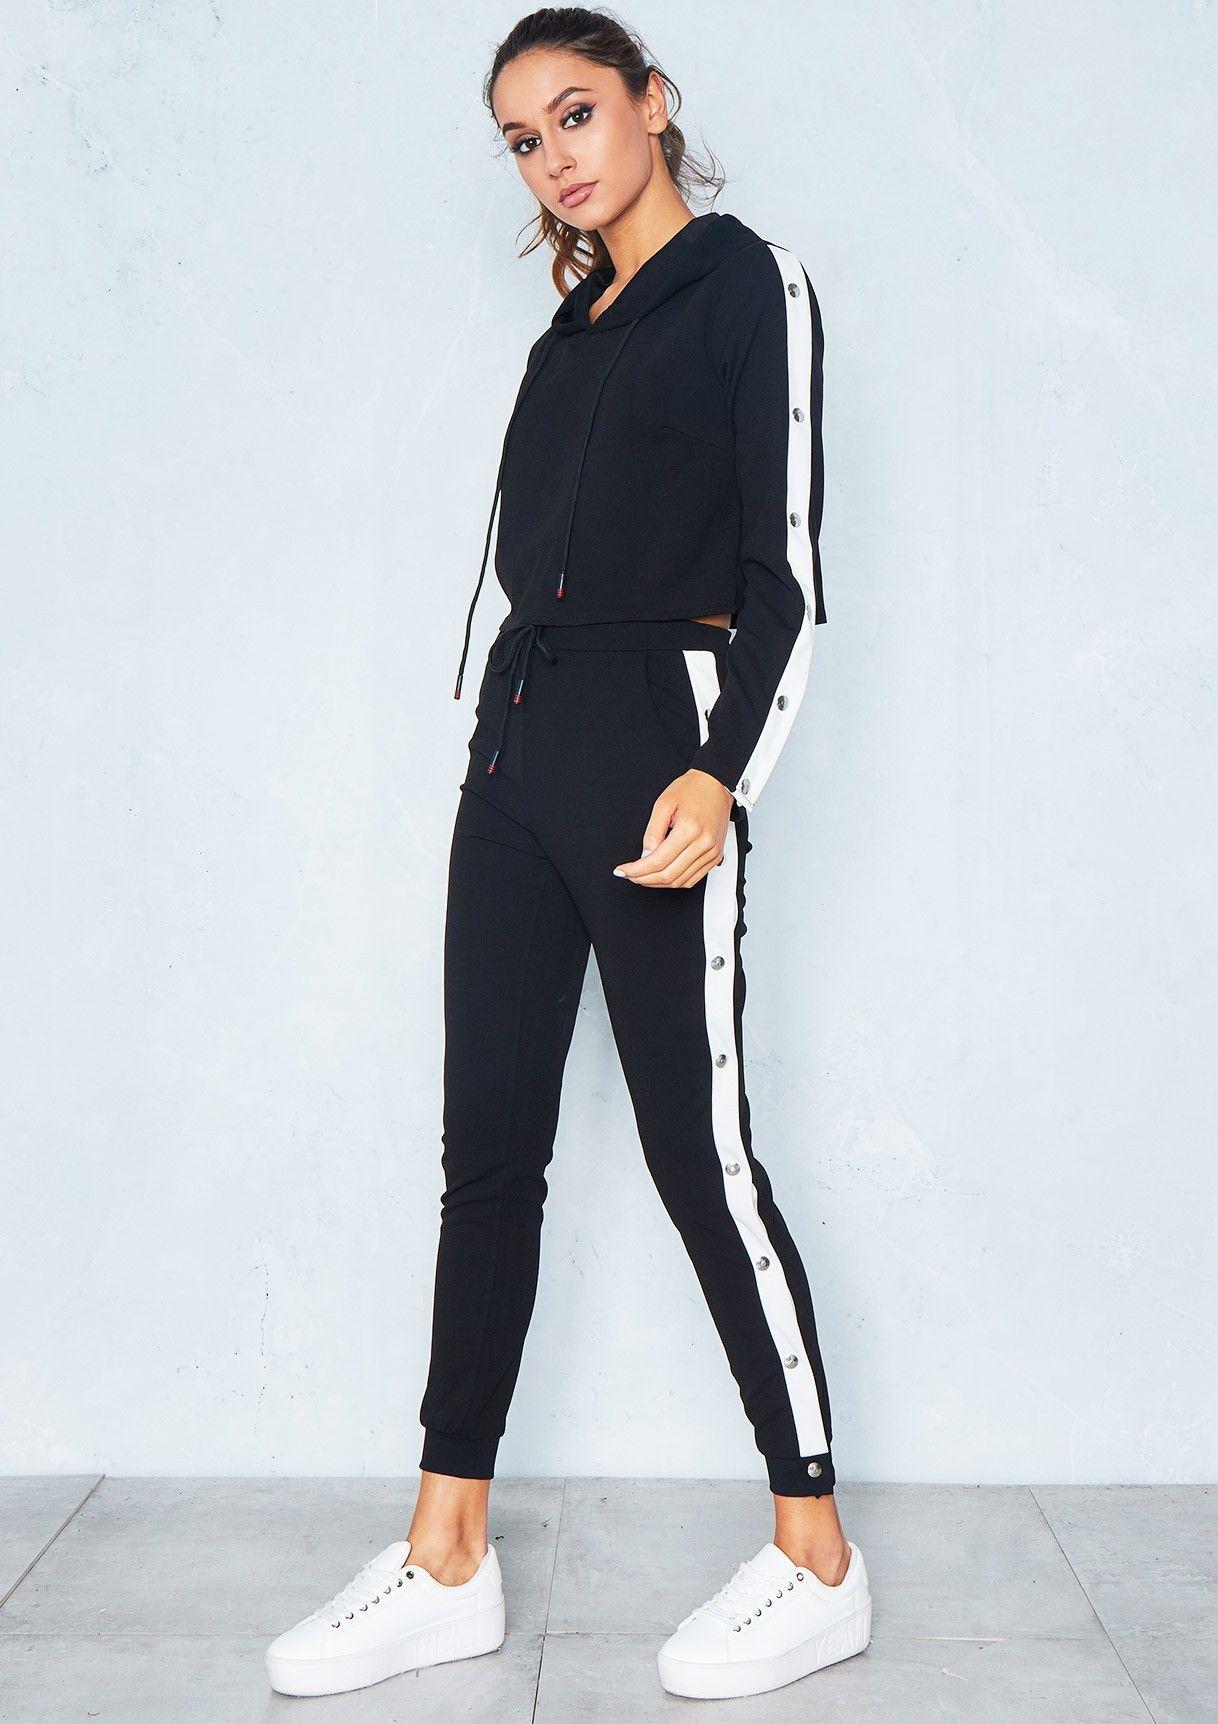 quality design 9bef8 3cdc1 Missyempire - Fliss Black White Side Stripe Cropped Loungewear Set